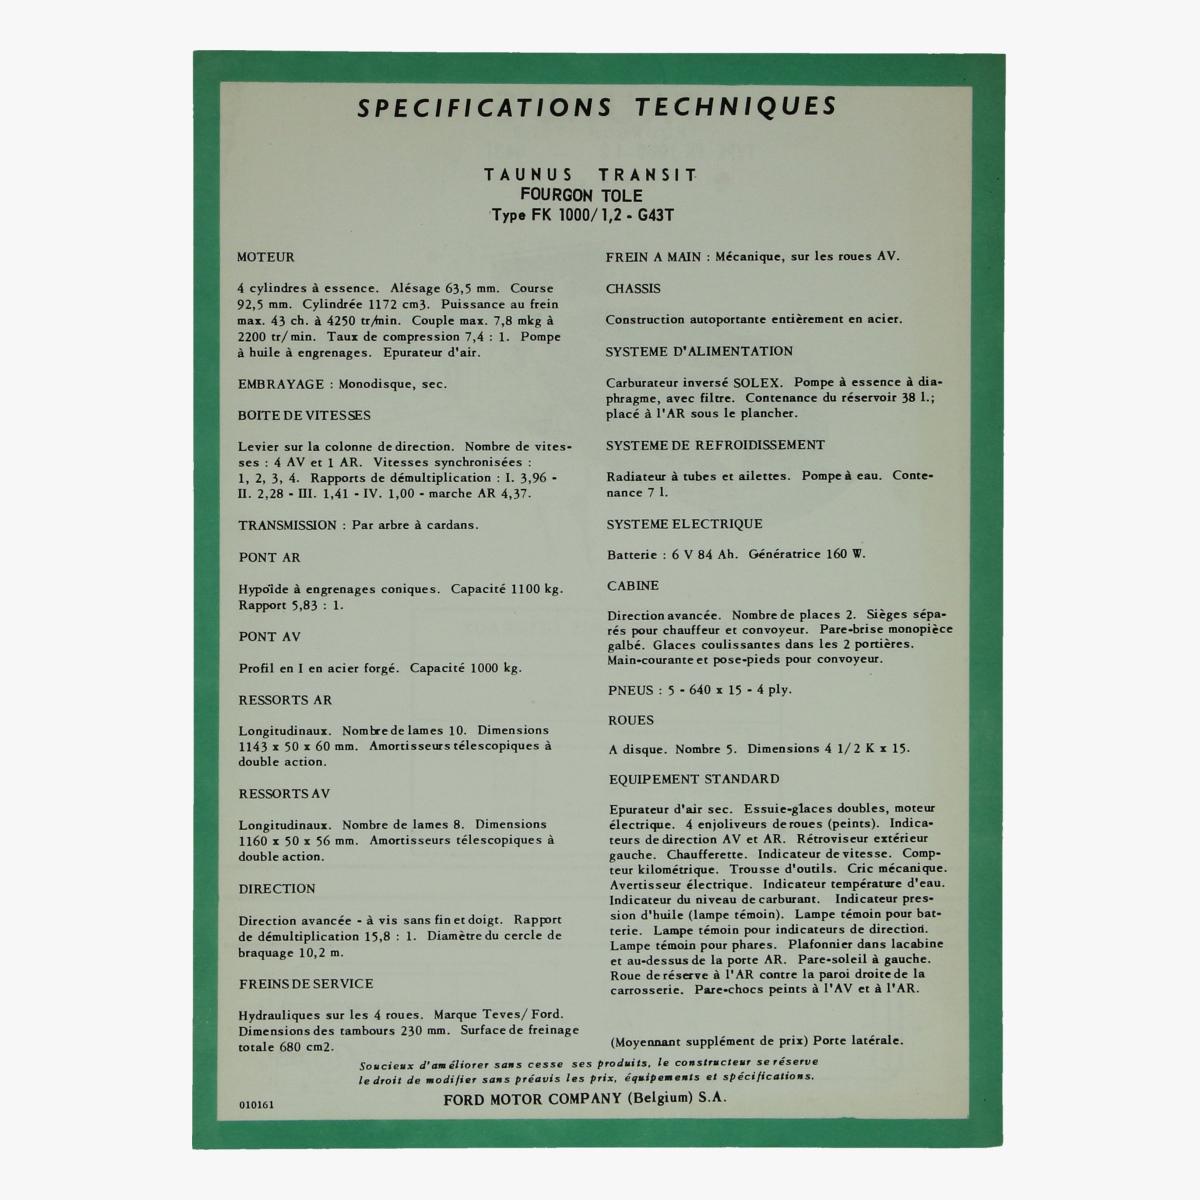 Afbeeldingen van specifications techniques taunus transit fourgon tole type fk 1000 ford motor company